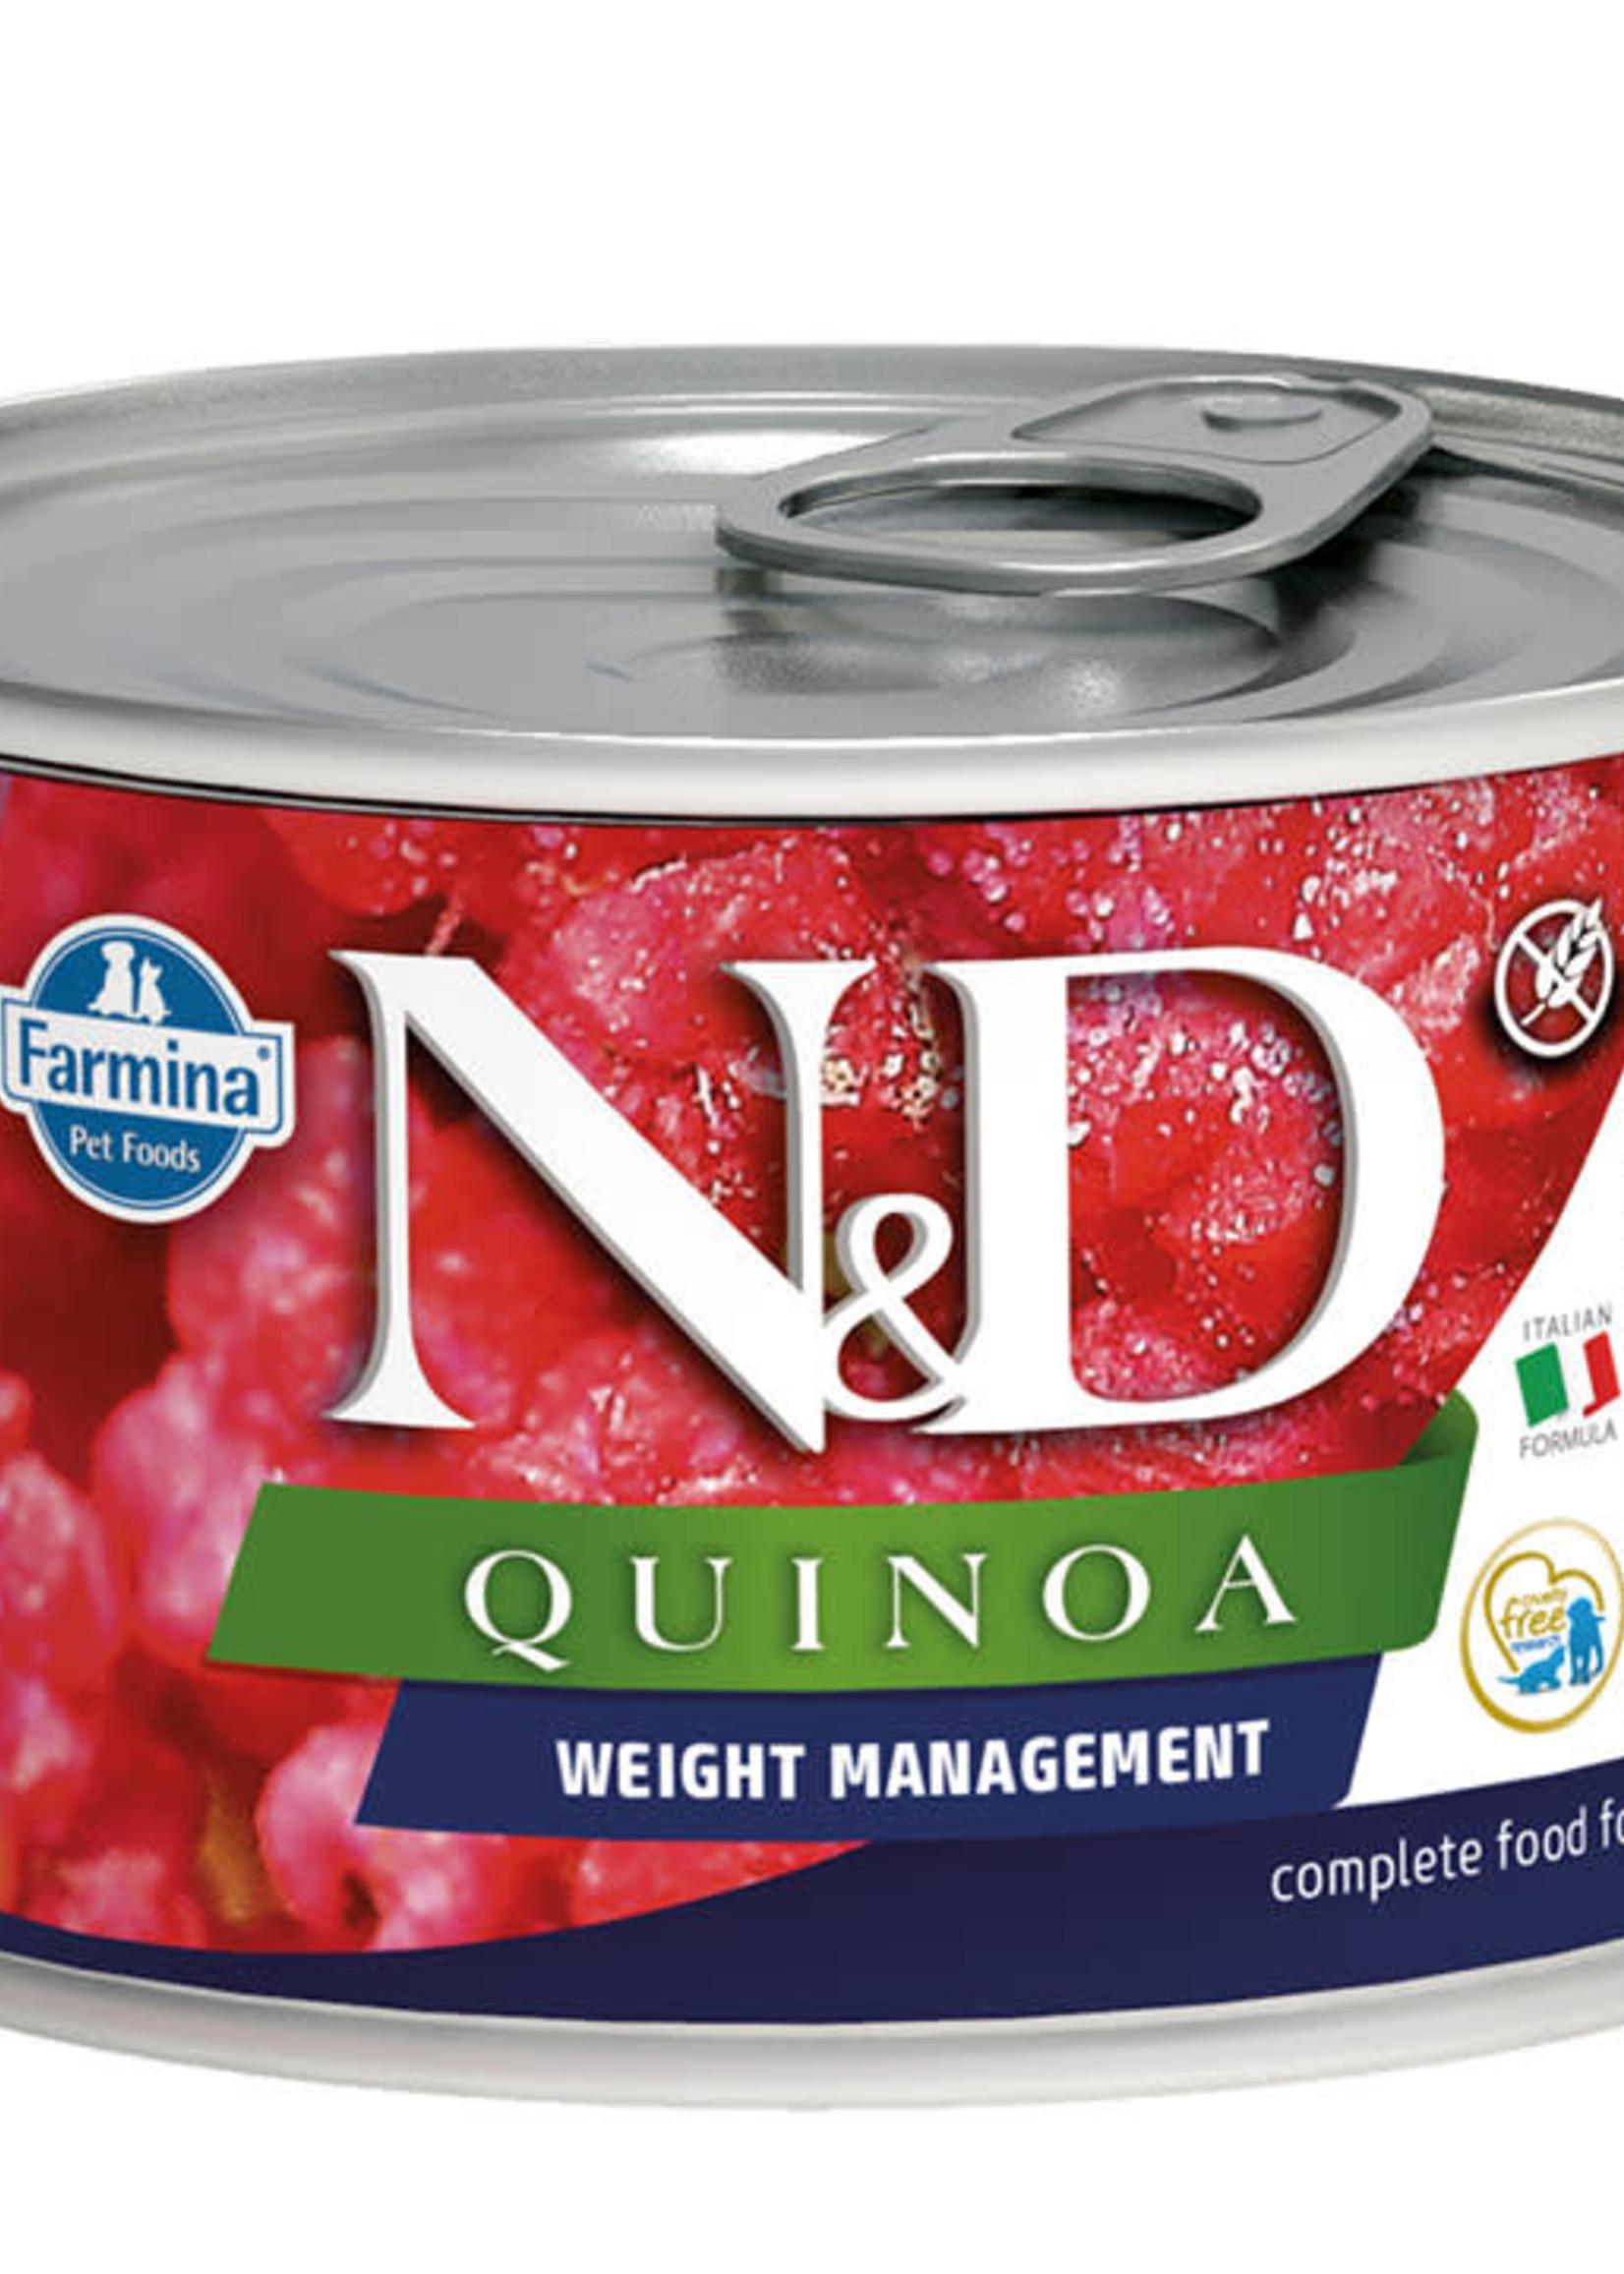 Farmina Farmina Dog Can Quinoa Weight Managment Lamb 4.9OZ